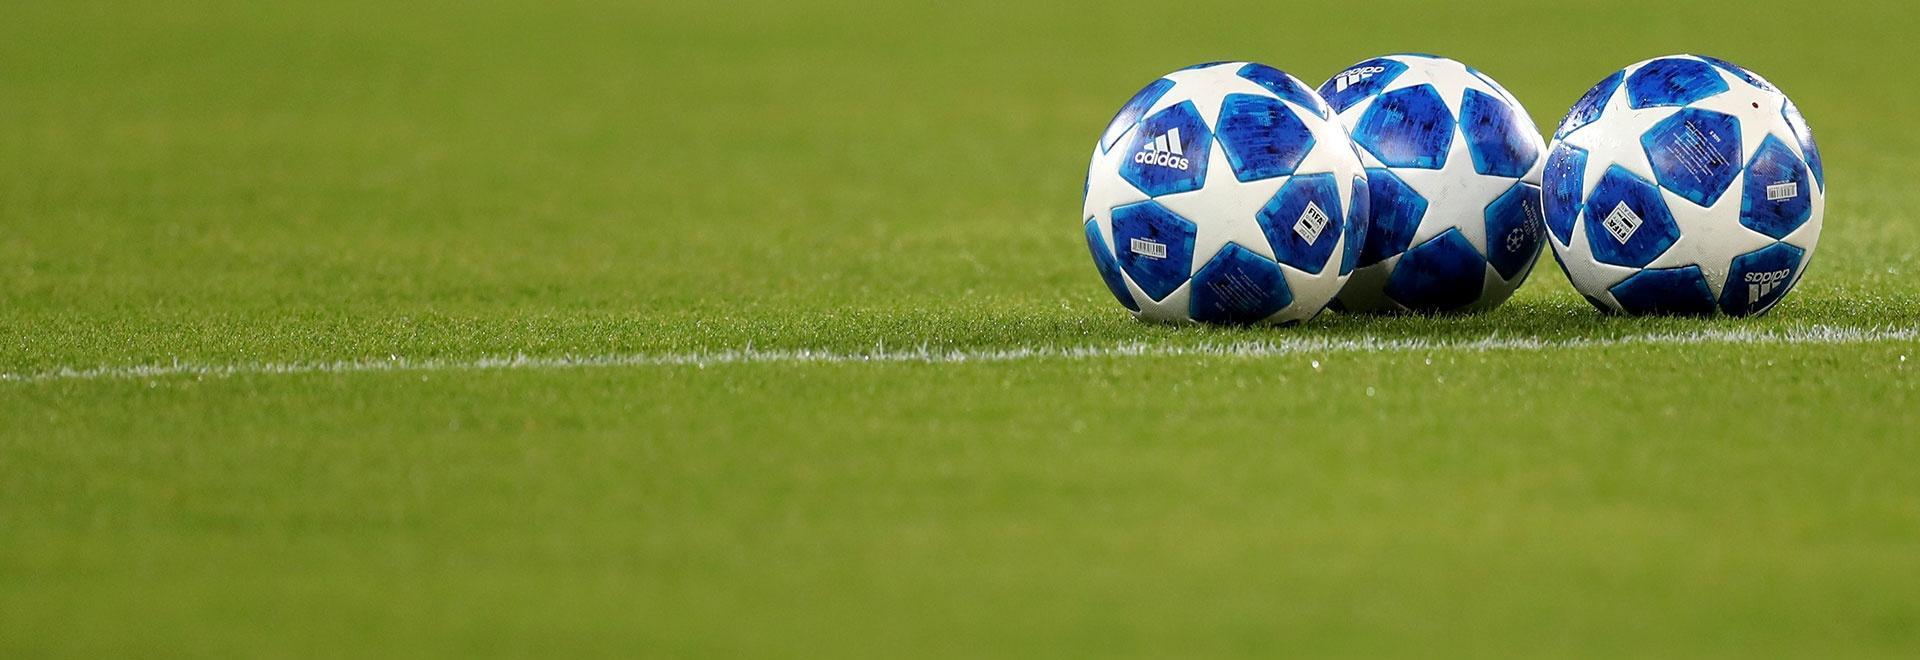 Real Madrid - Tottenham 05/04/11